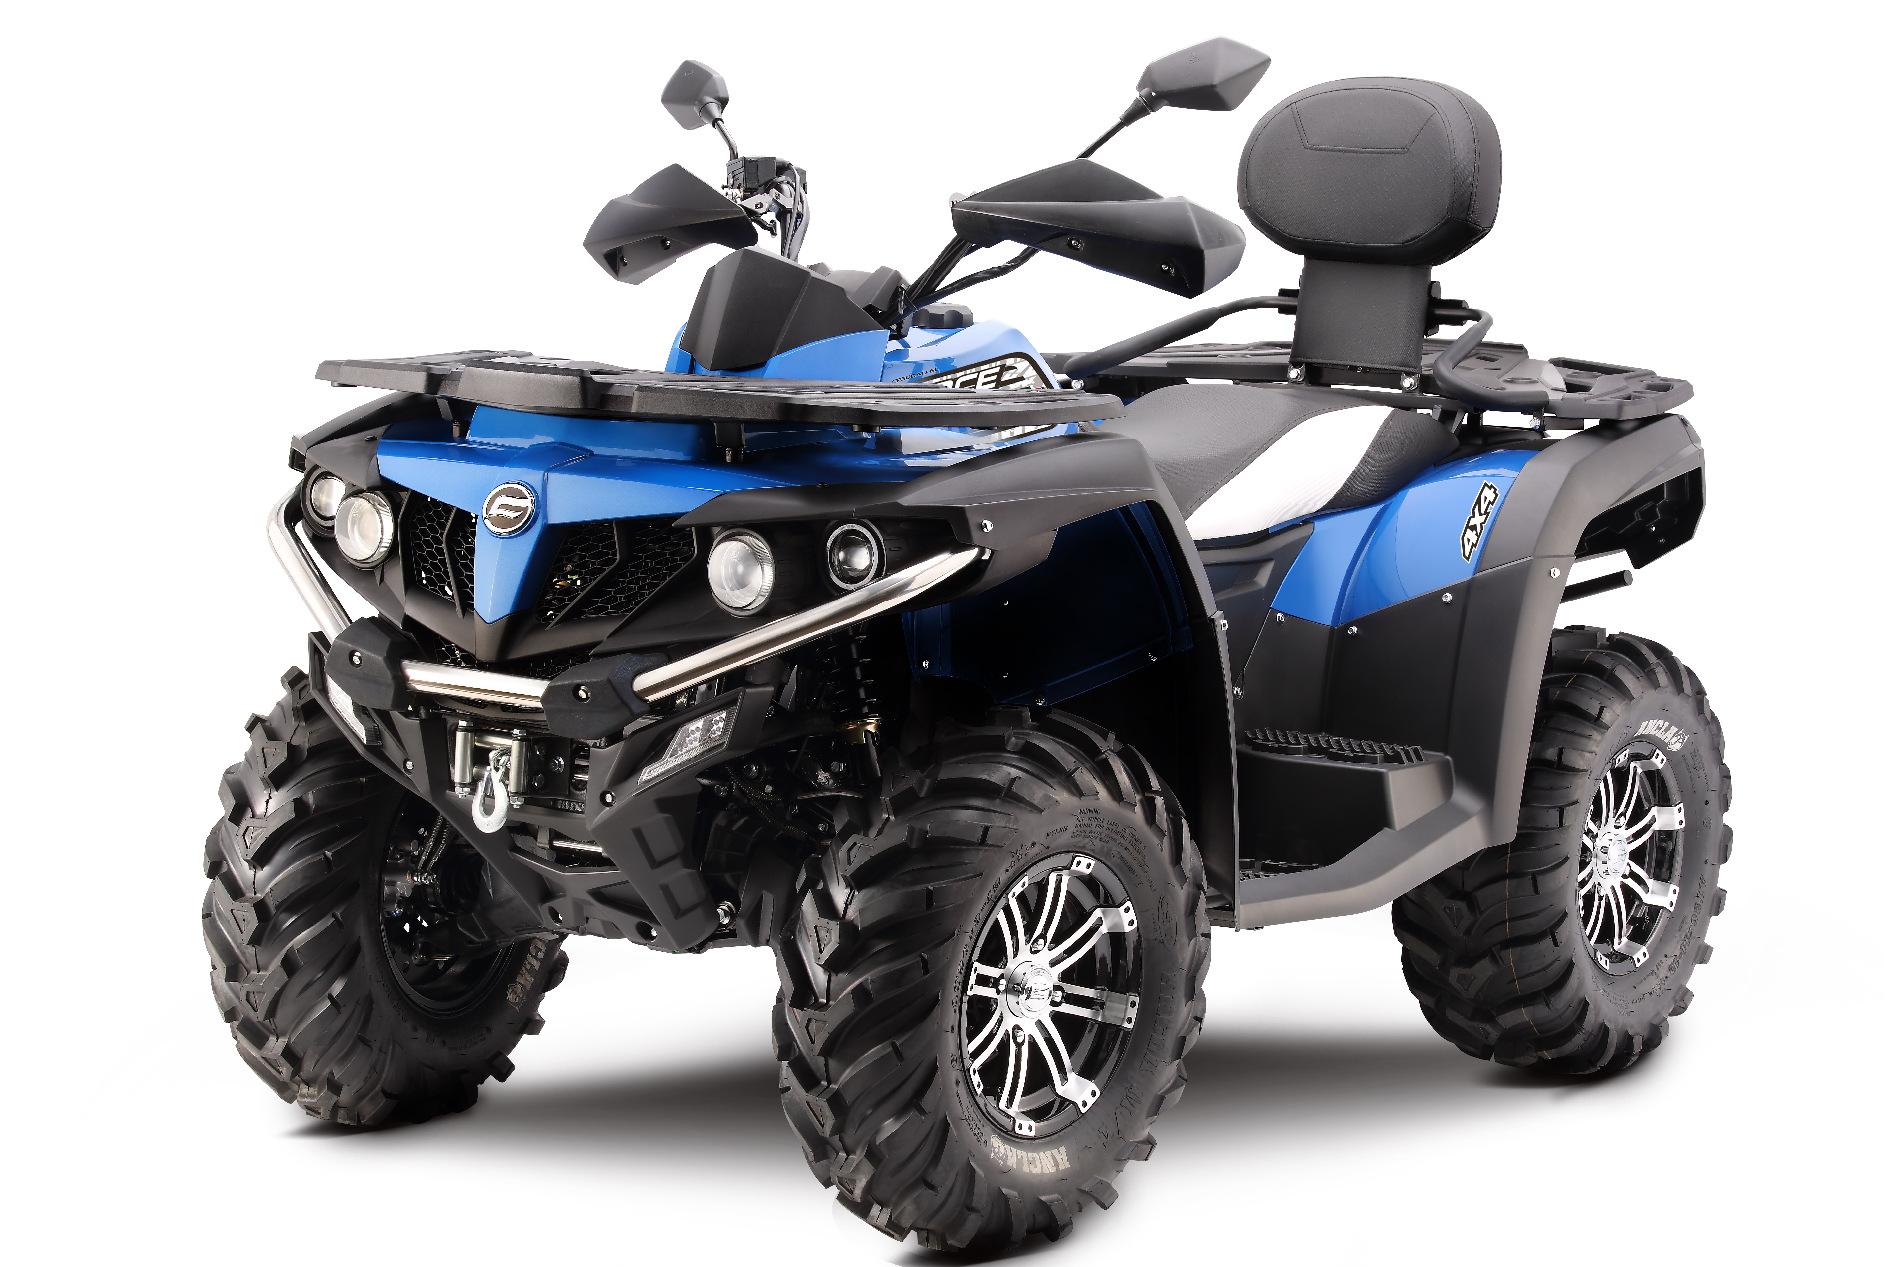 Gladiator X550 EPS